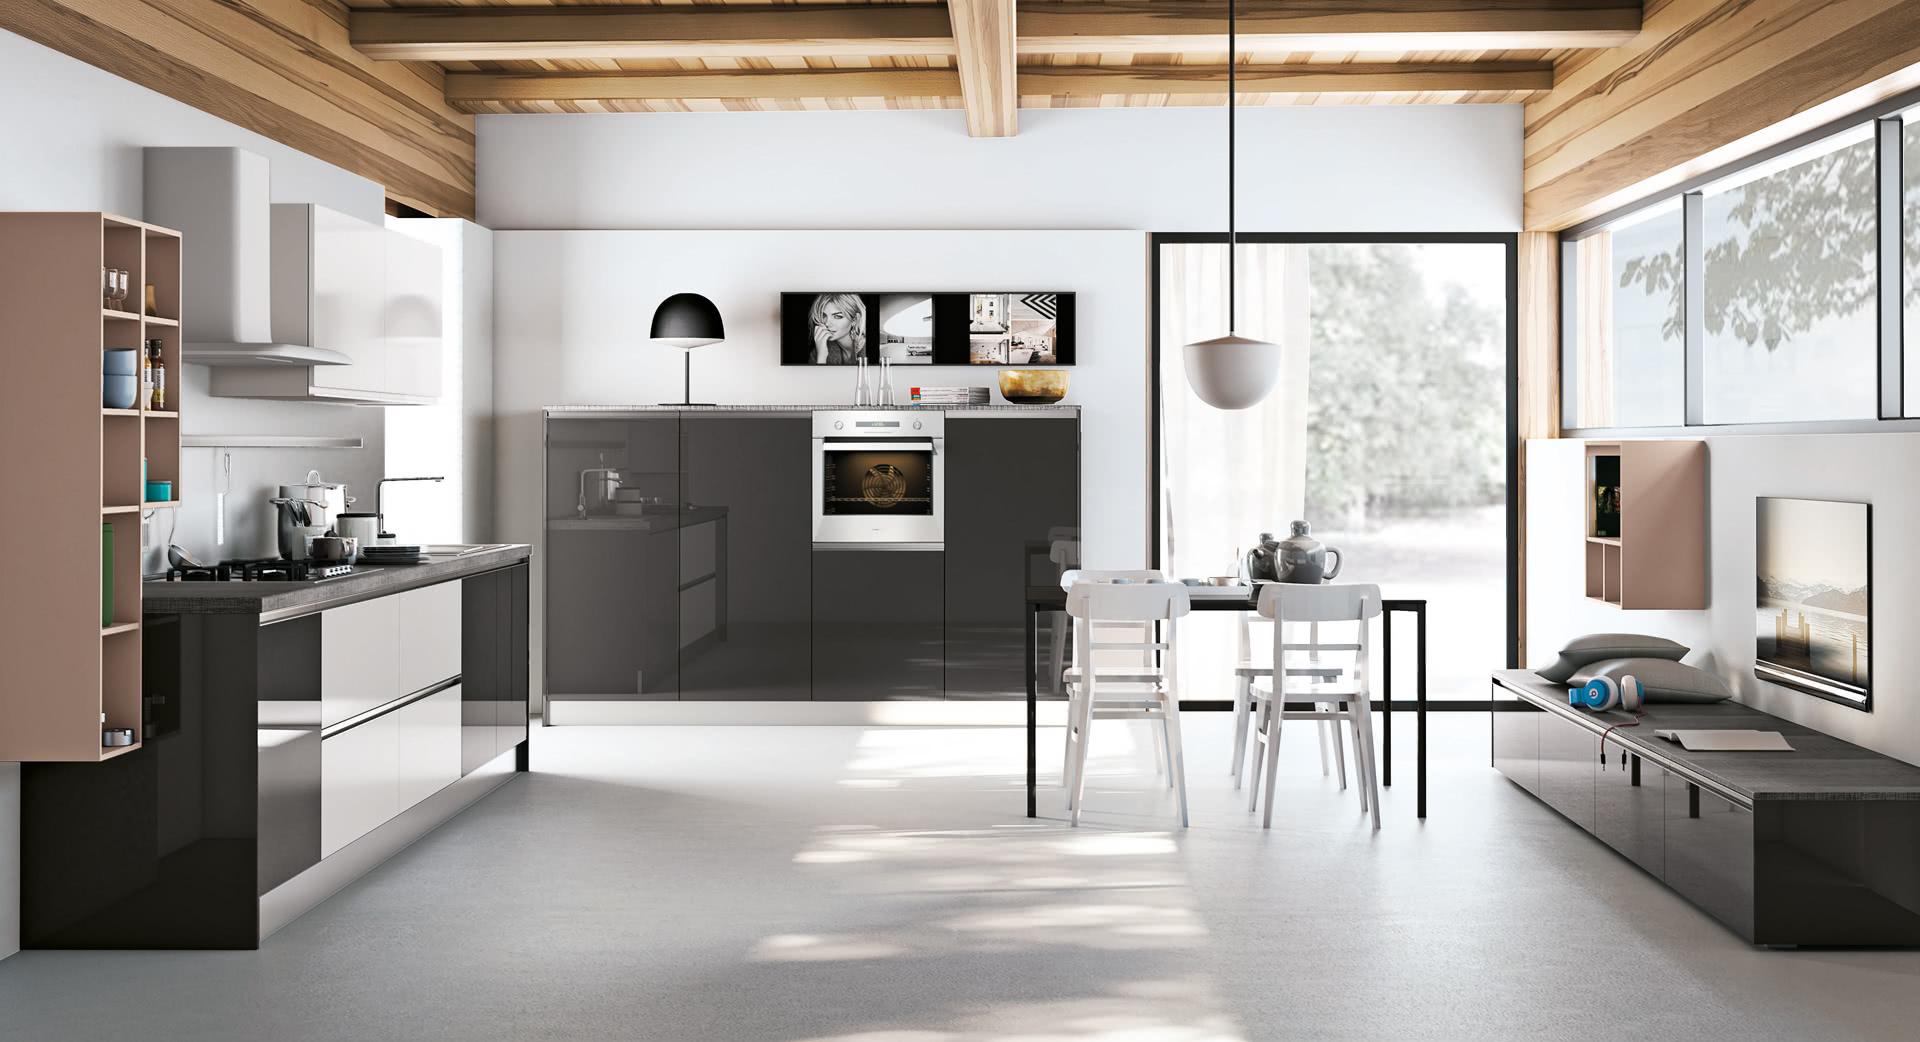 Cucina moderna lube nita creo kitchens for Dos arredamenti